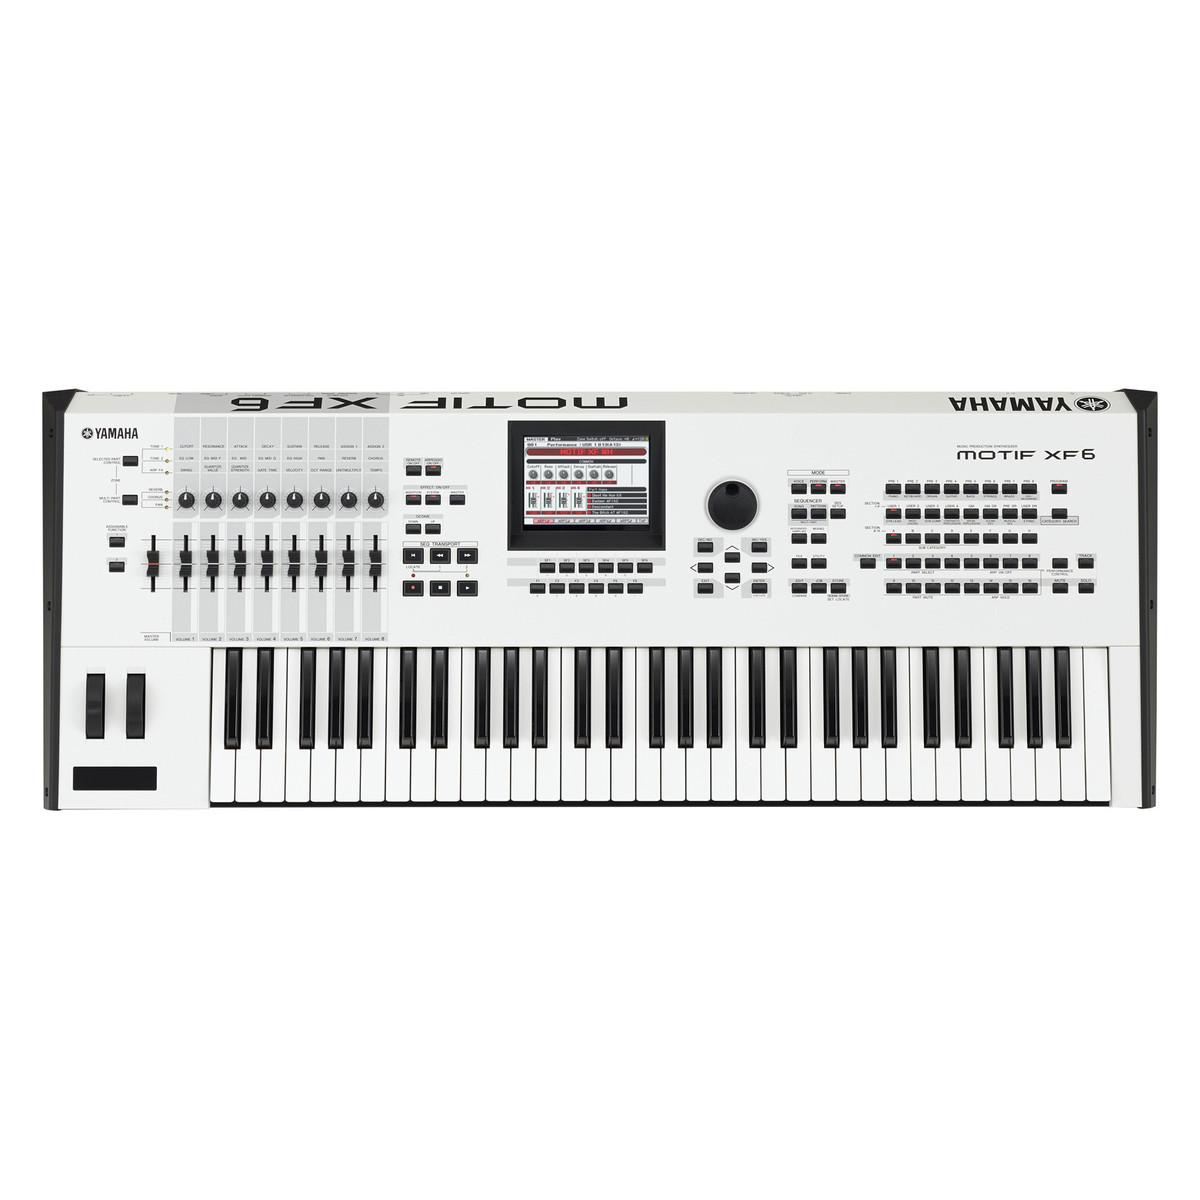 Yamaha MOTIF XF6 Keyboard Workstation, Limited Edition White - Ex Demo